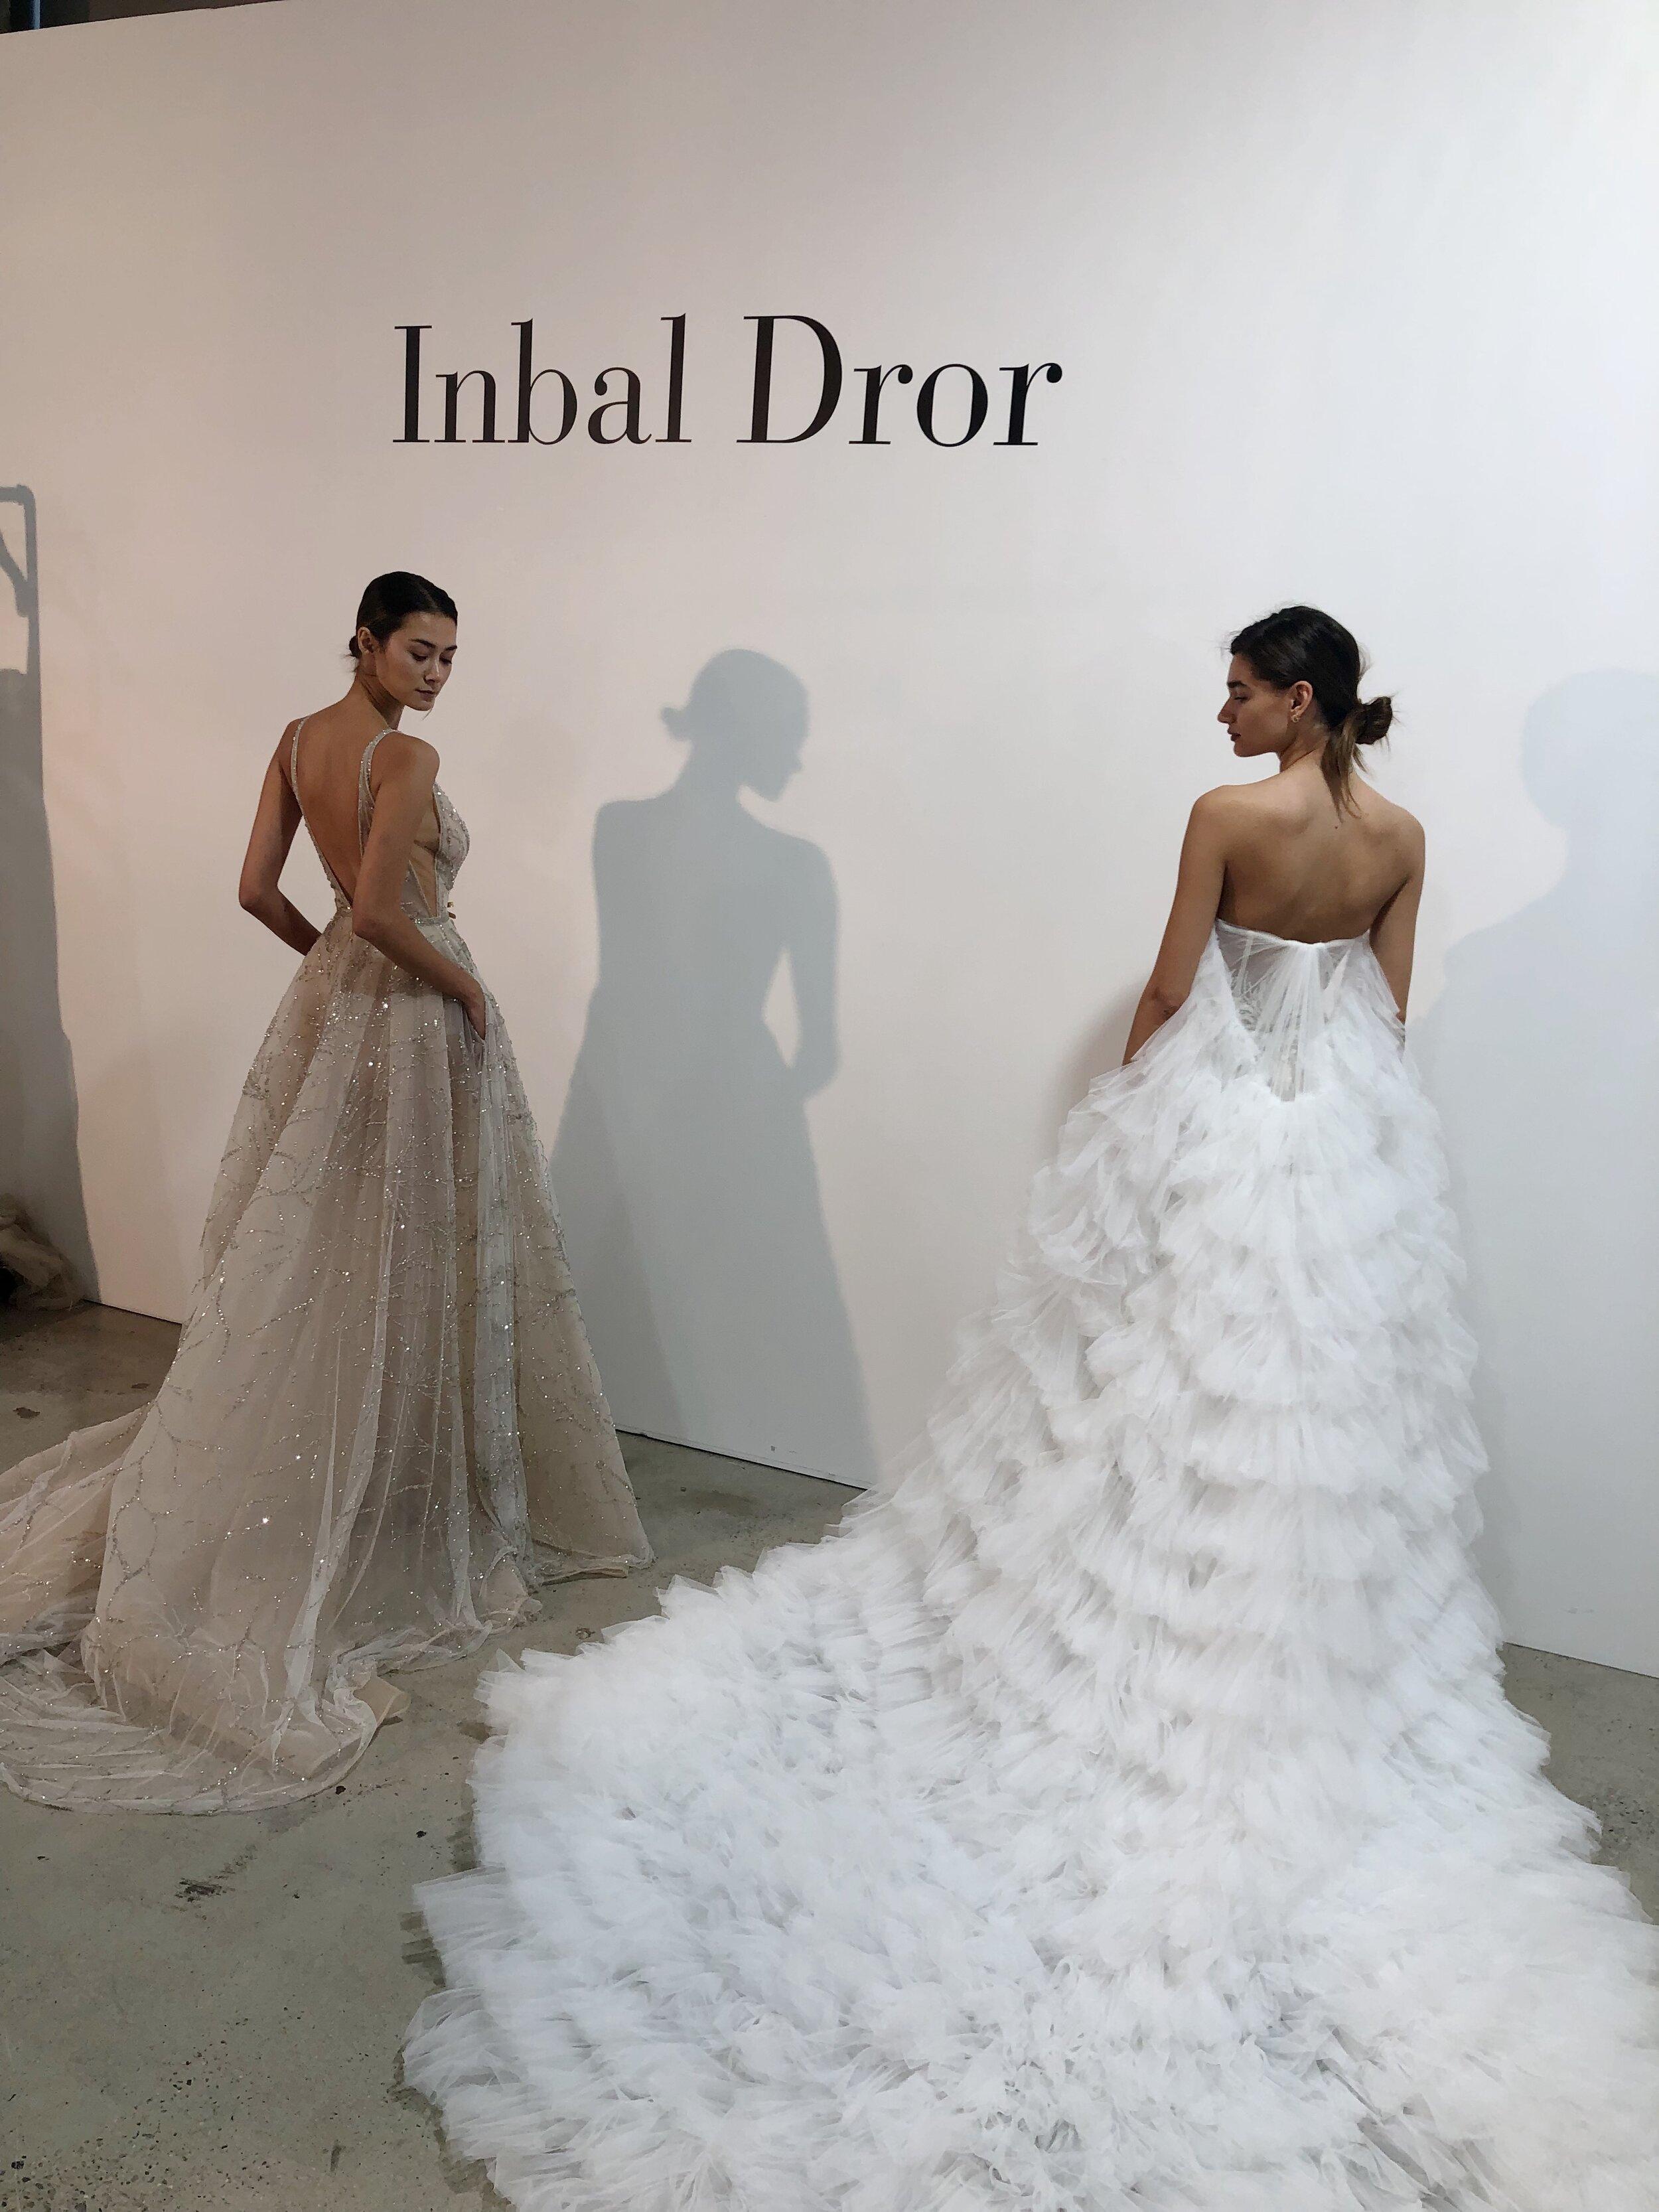 inbal dror fall 2020 collection new york fashion week